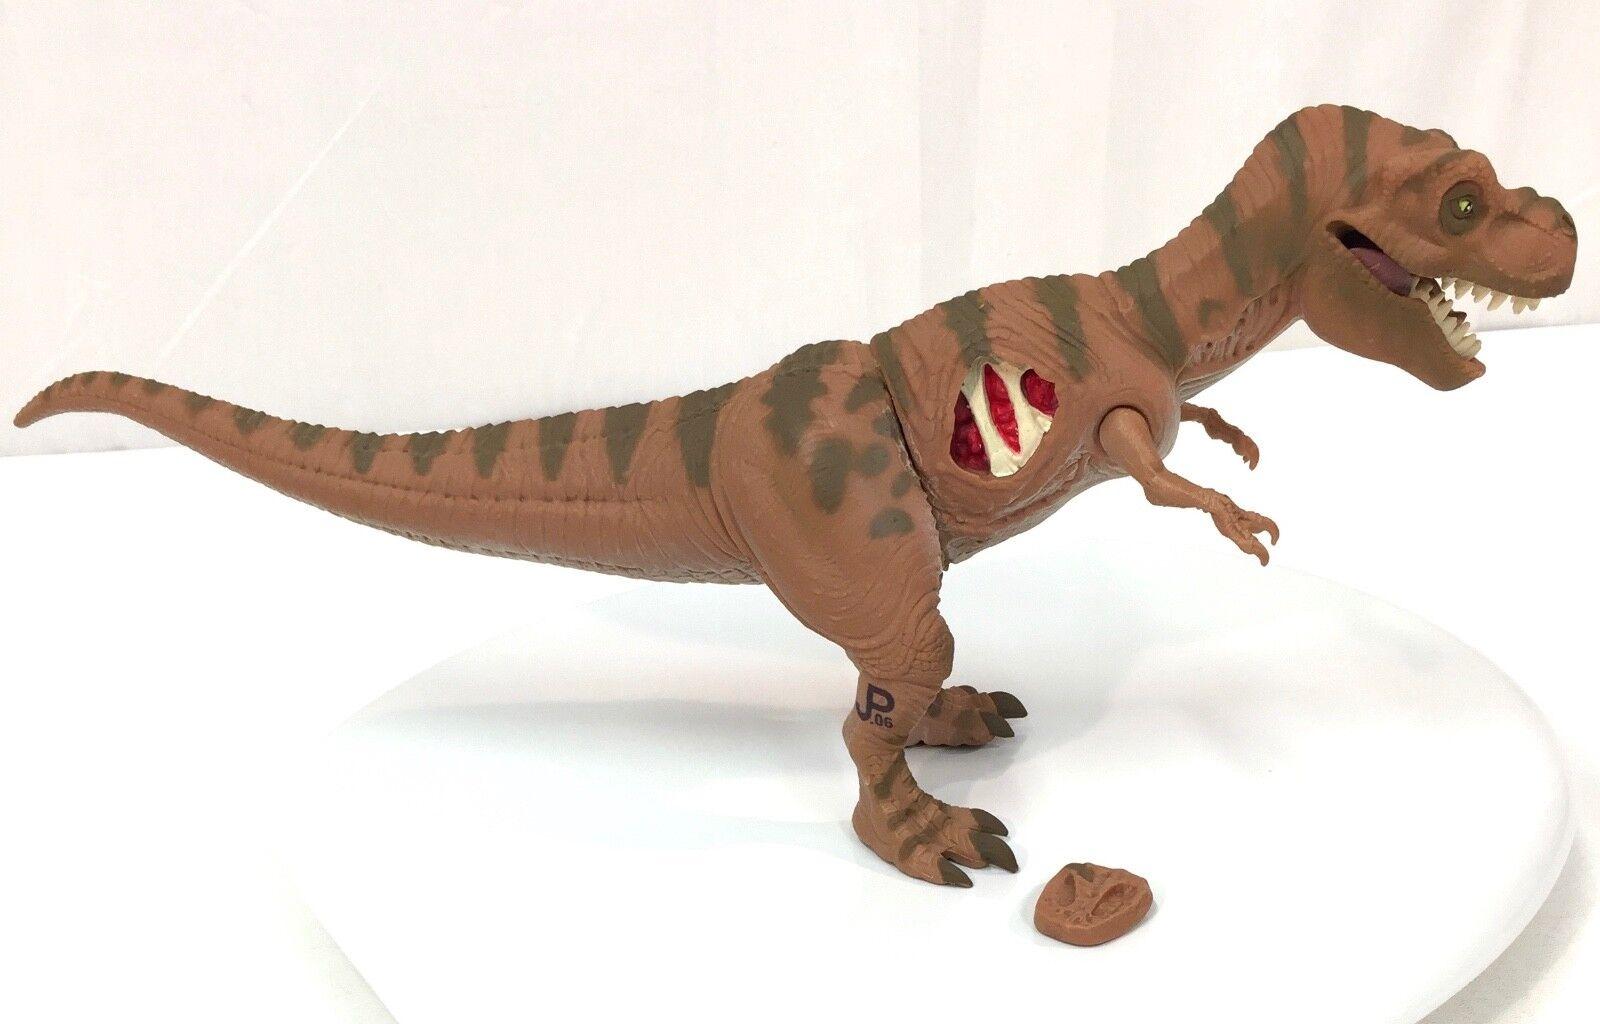 Jurassic Park jp06 Young Tyrannosaurus Rex T-Rex Dinosaur Complete 1993